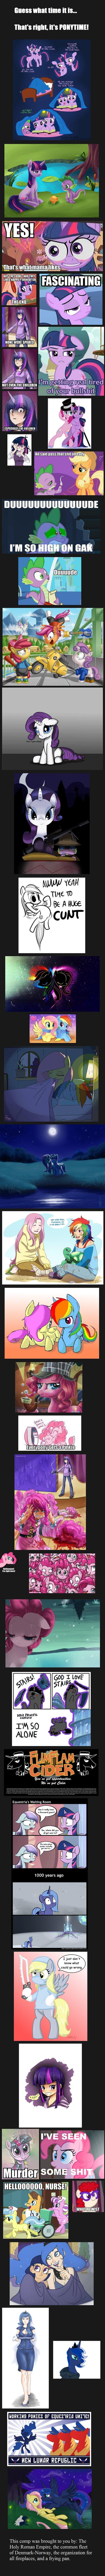 Ponycomp 213. Ponycomp 212: /channel/ponytime/Ponycomp+212/hsMjGuf/ DOWNLOAD LINK: docs.google.com/folder/d/0B4SOCzXHPRD..... Yesh, yesh, more Flutterdash. My Little Pony ponies ponytime